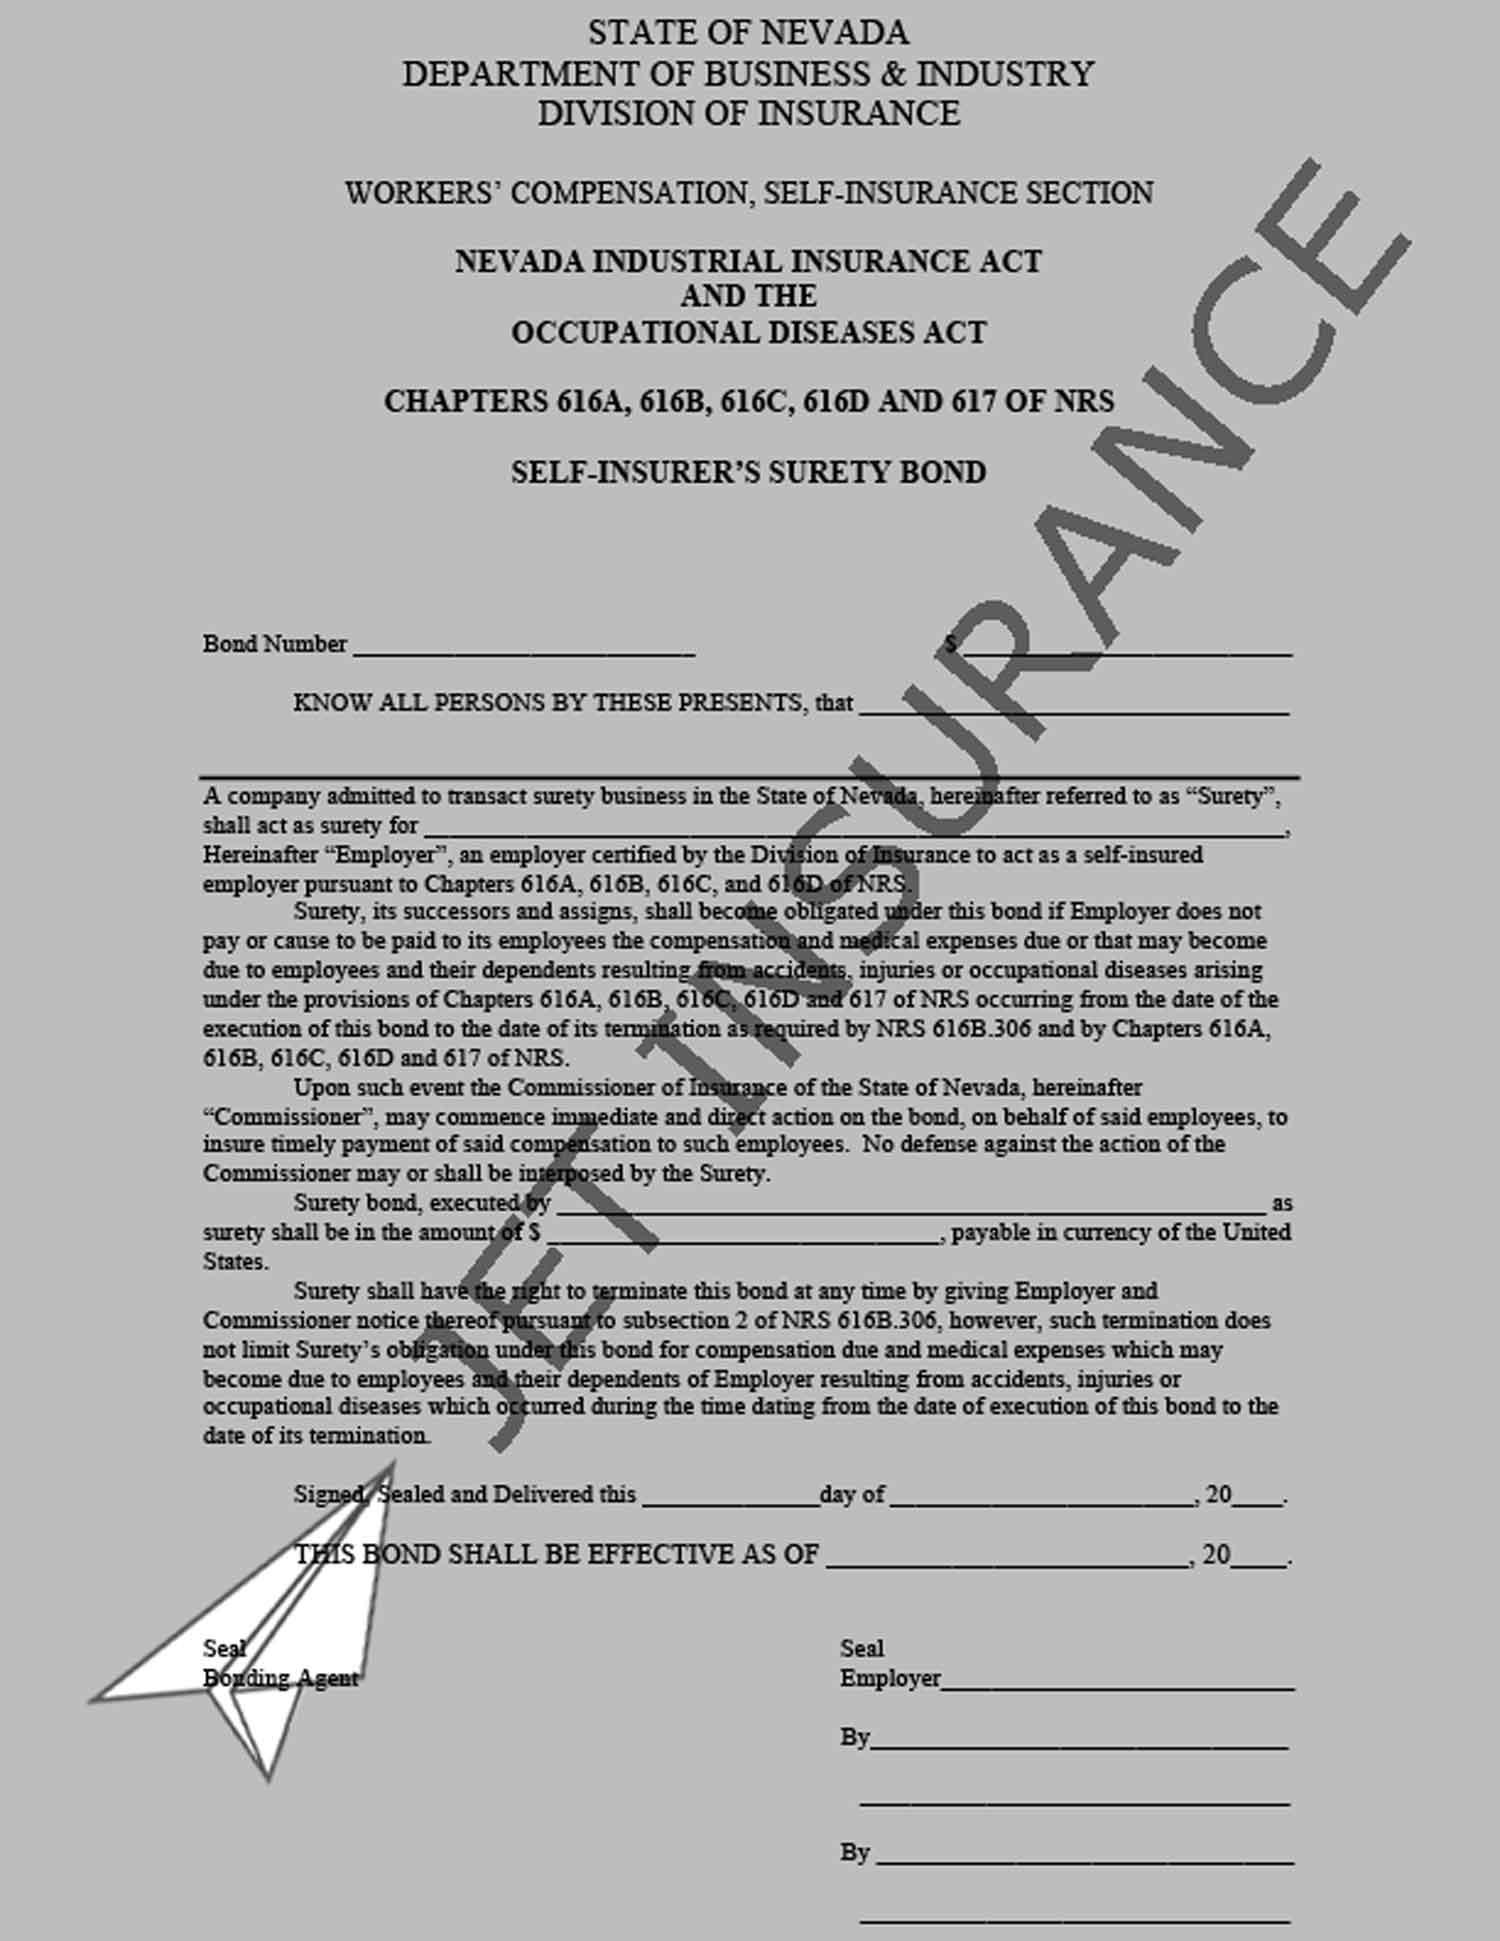 Nevada Self-Insured Employer Bond Form